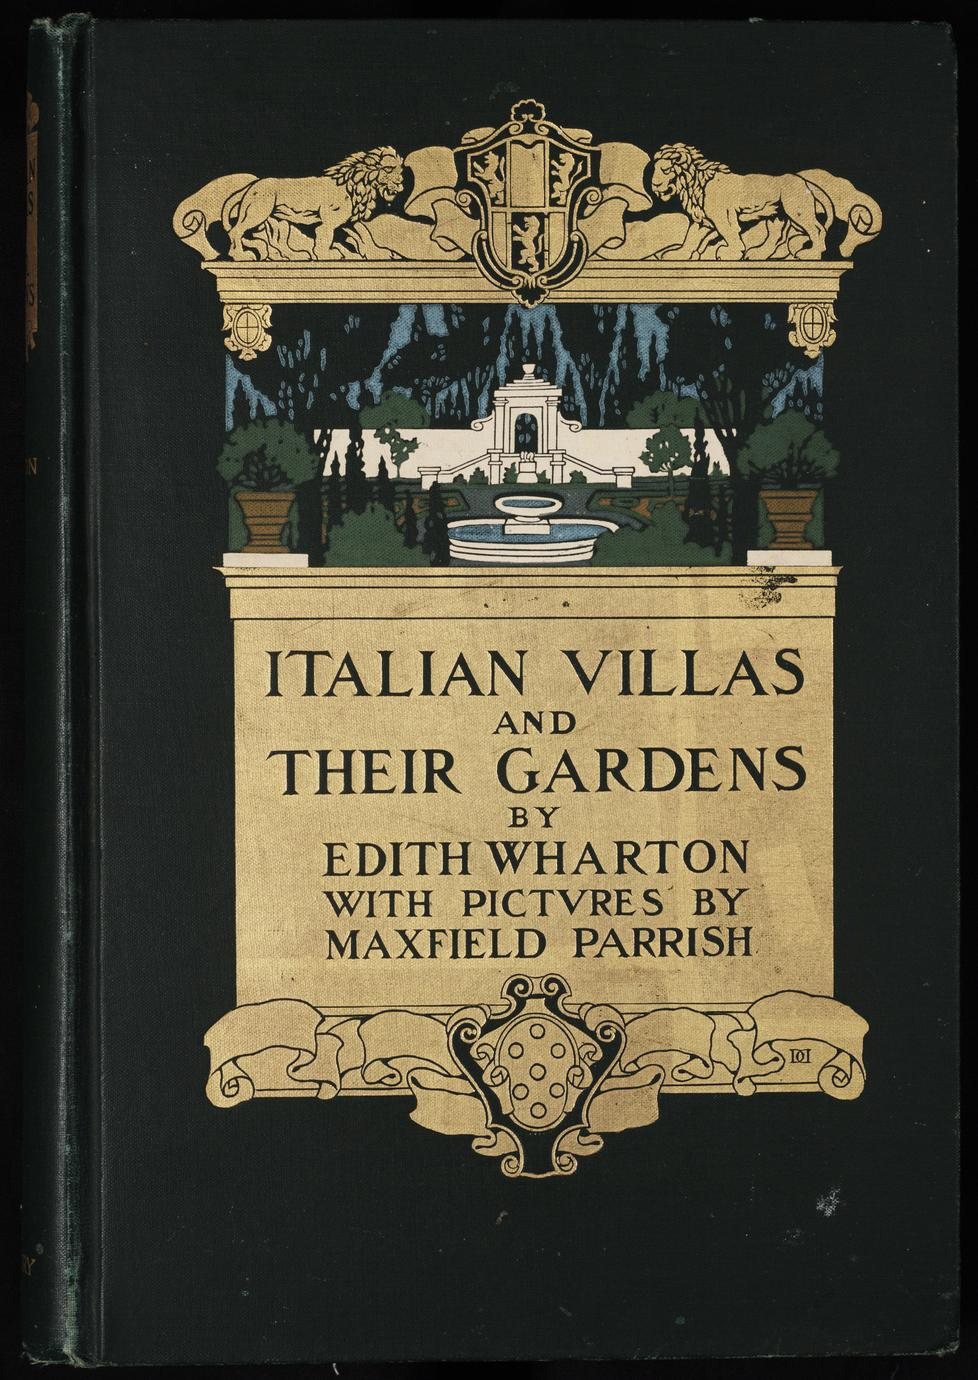 Italian villas and their gardens (1 of 3)